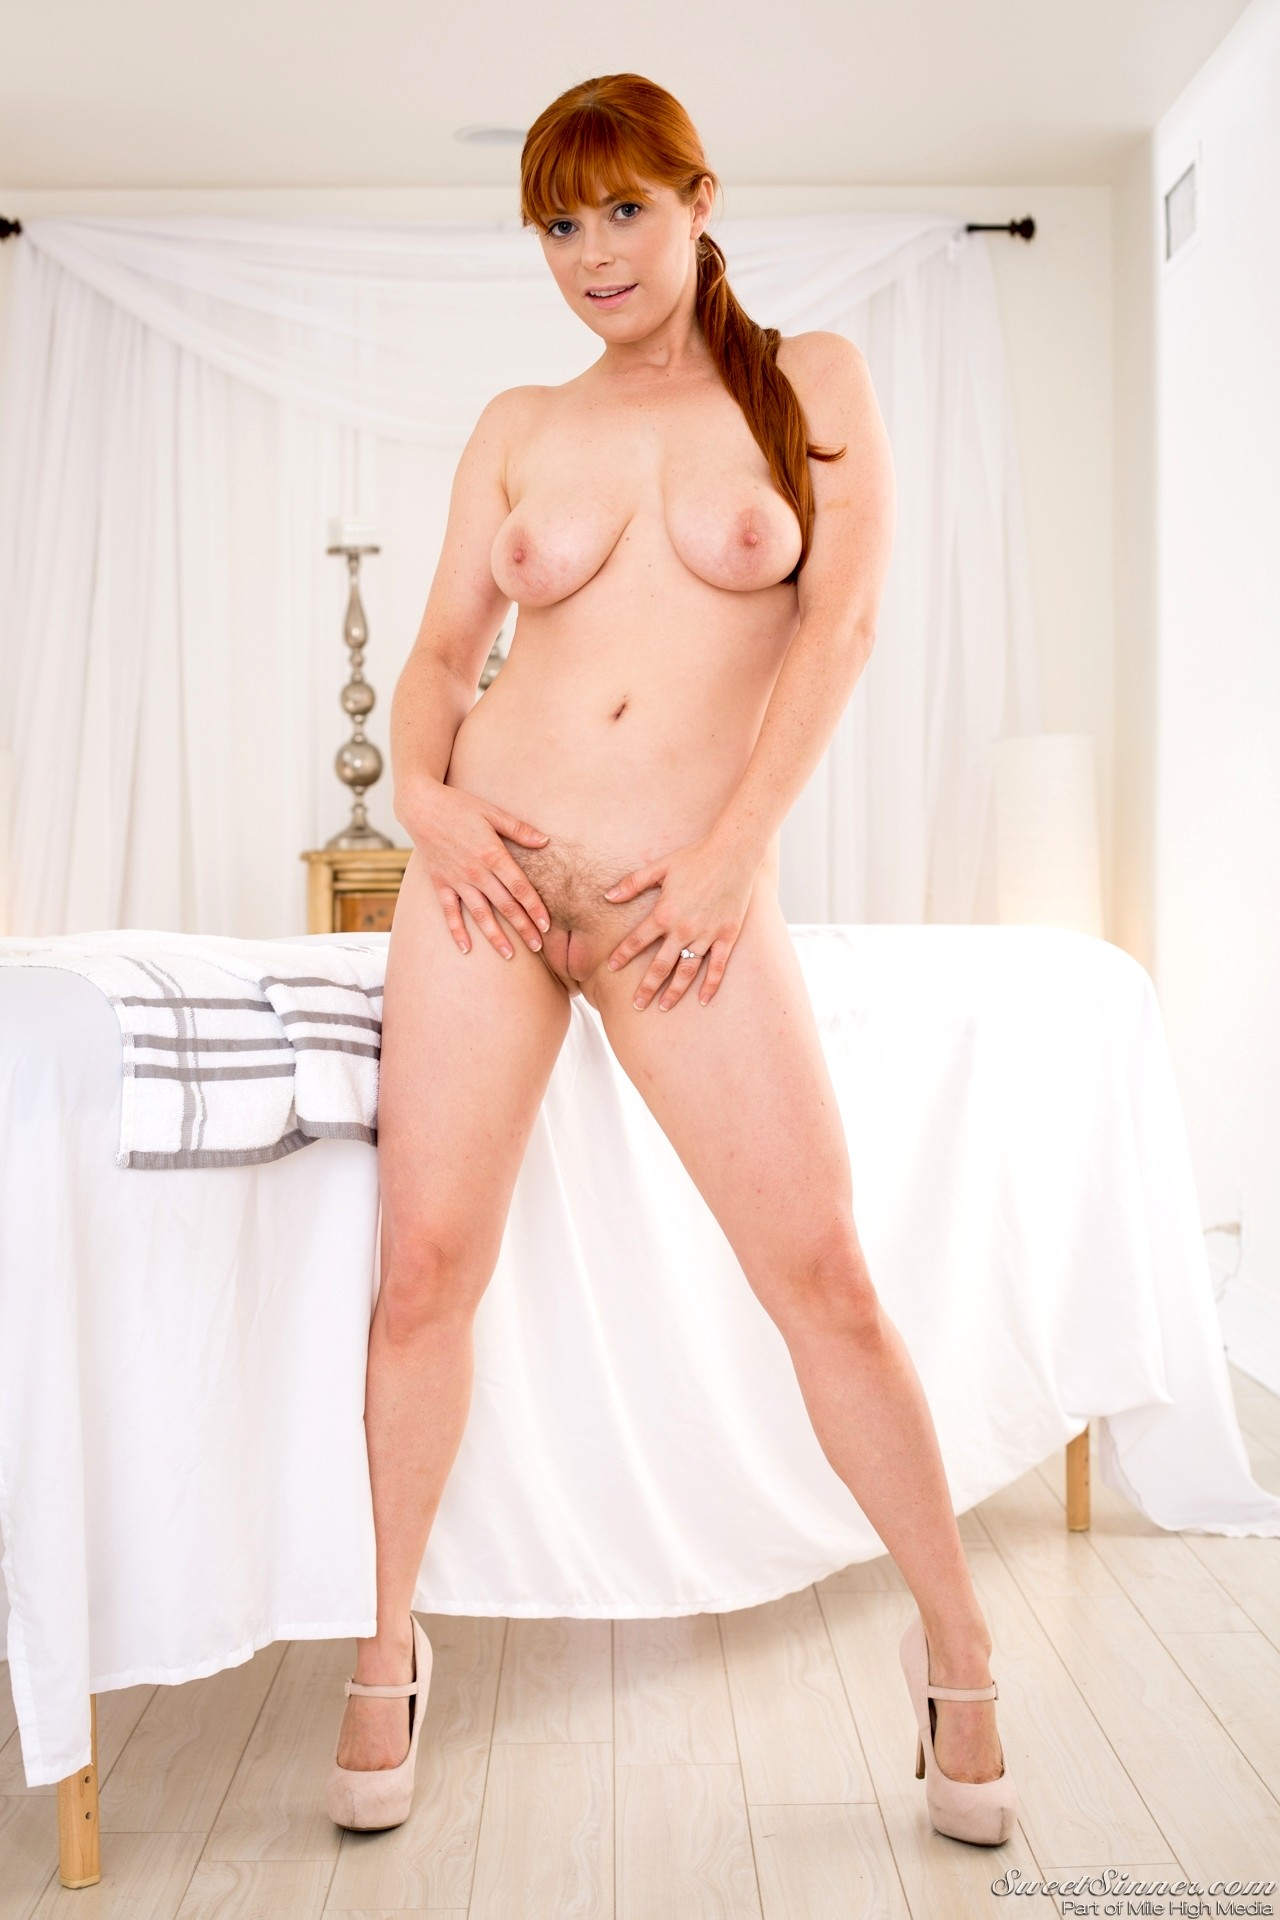 a girl masterbating porn